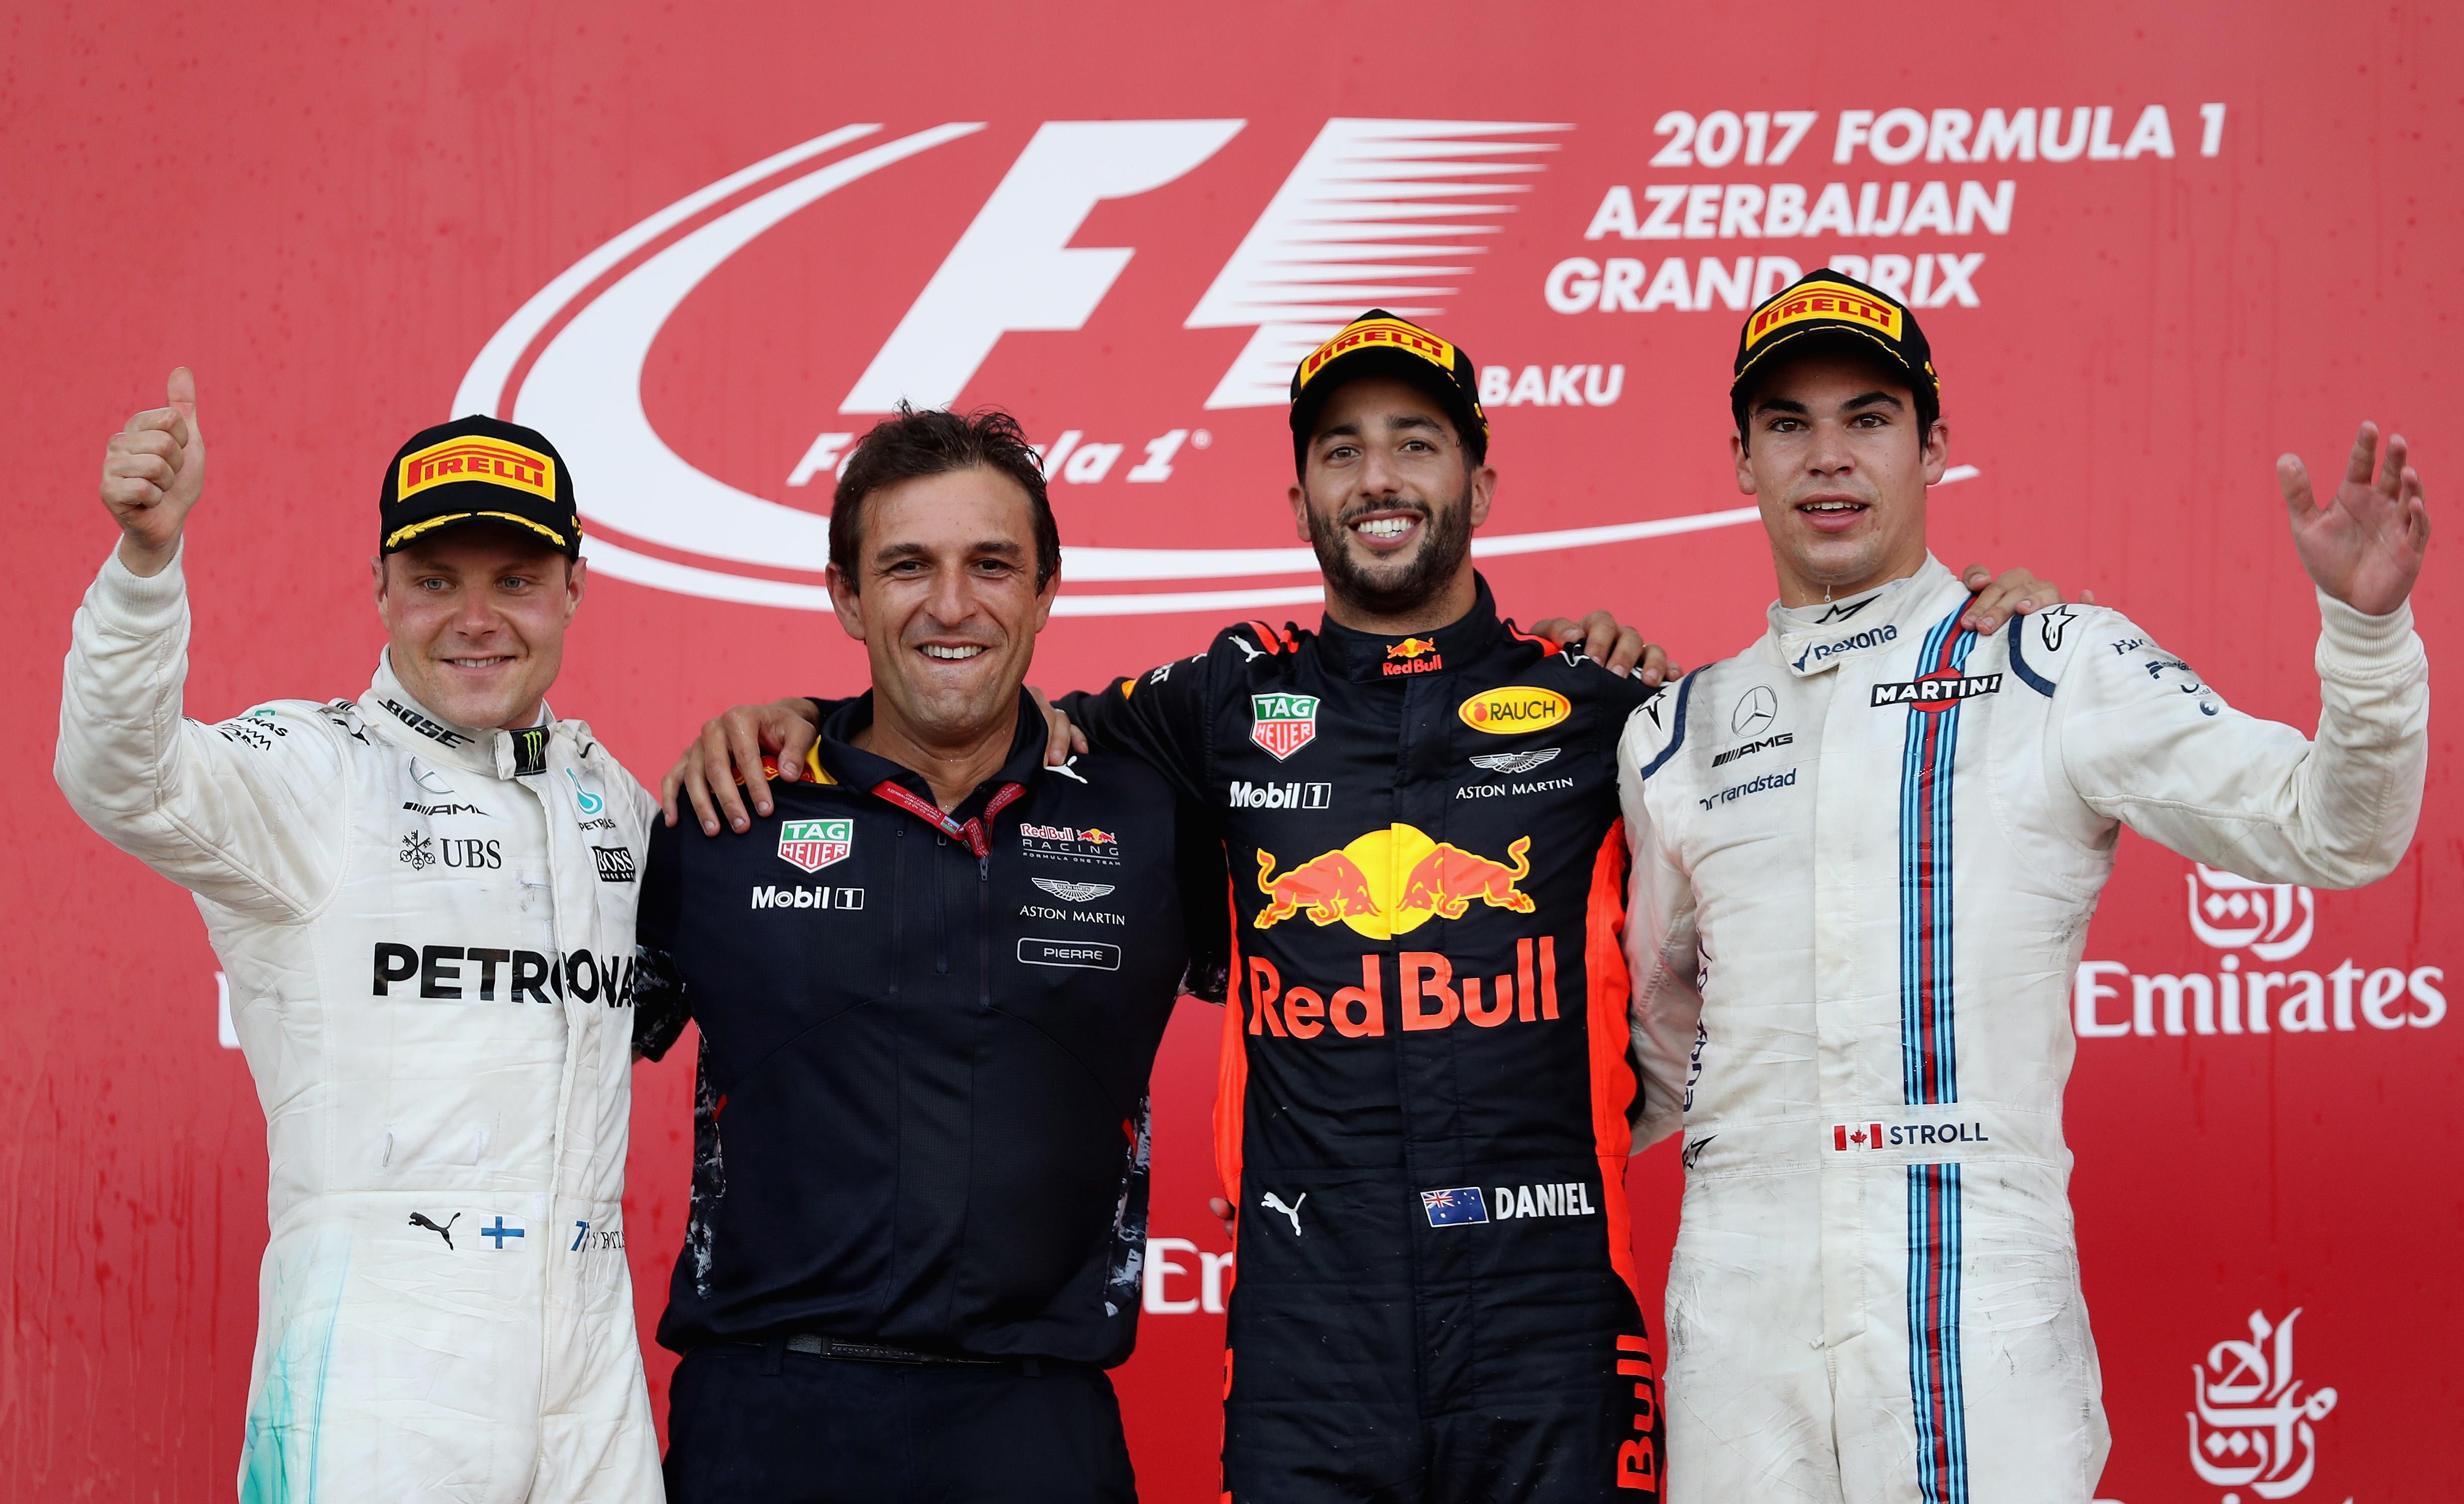 From Lewis Hamilton V Sebastian Vettel To Ayrton Senna Alain Prost Expects Indian Circuit Be Secondfastest F1 Track Valtteri Bottas Daniel Ricciardo And Lance Stroll On The Podium After Race